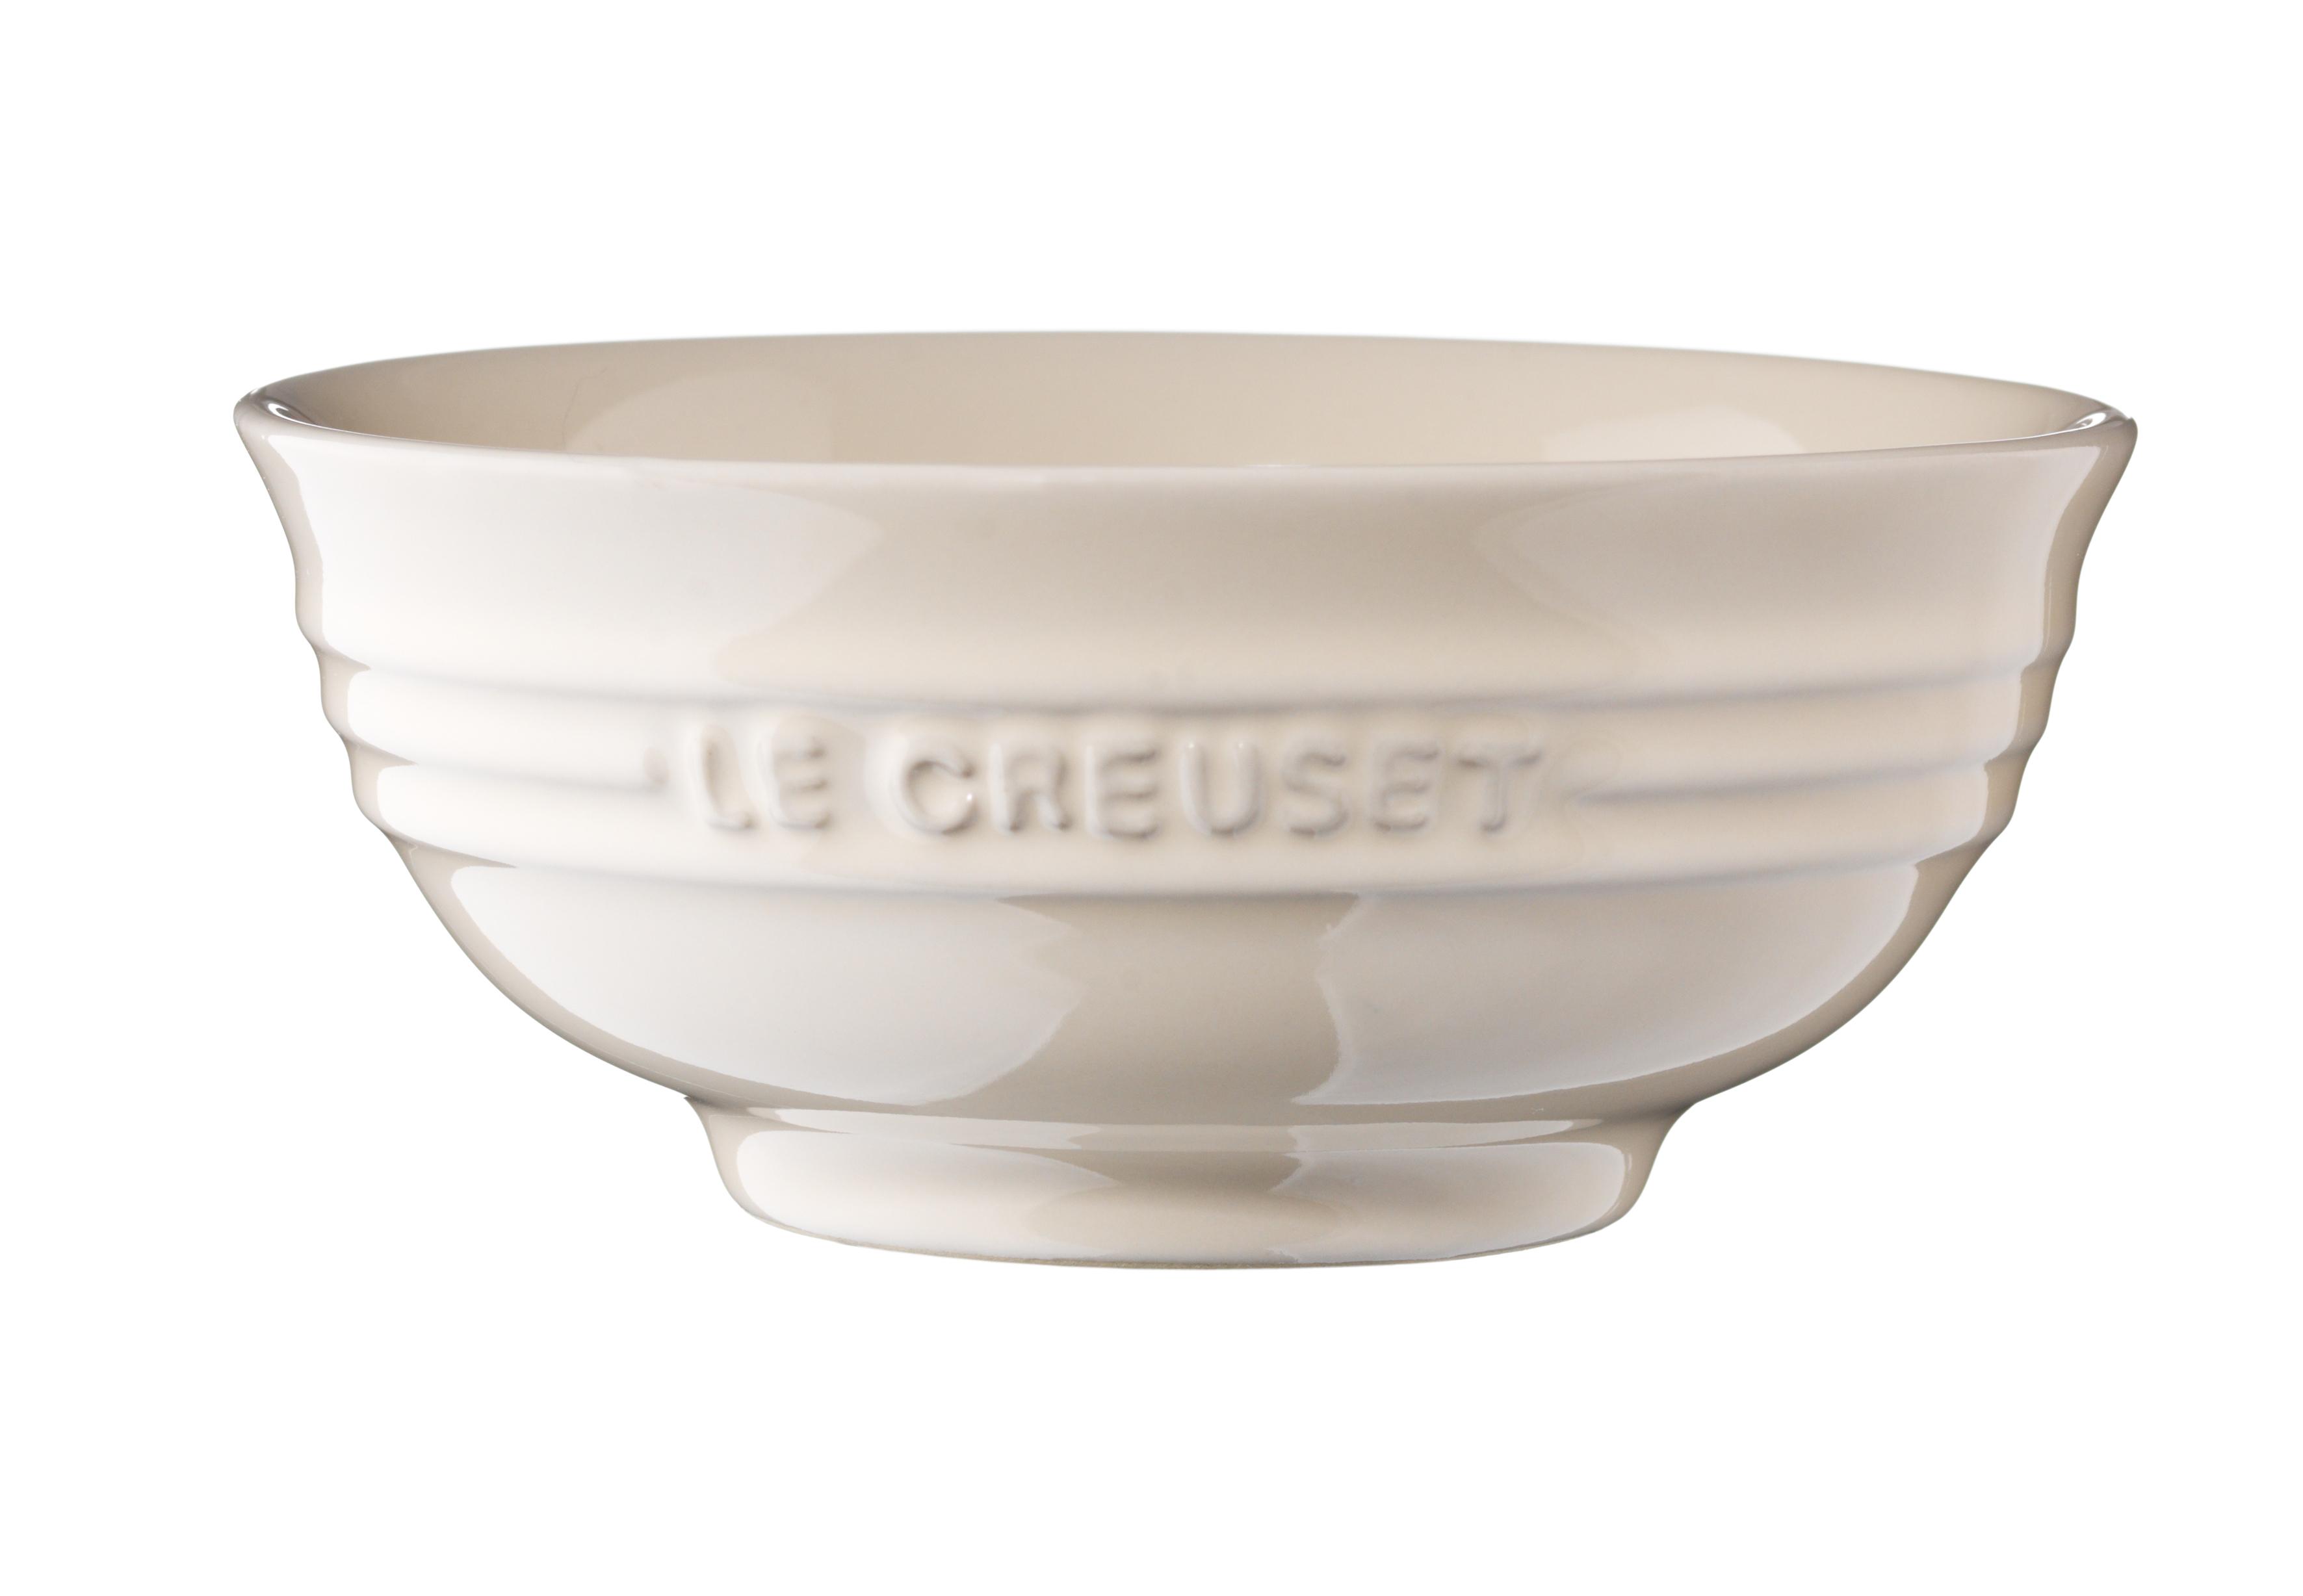 Le Creuset Dippskål 10,5 cm Creme